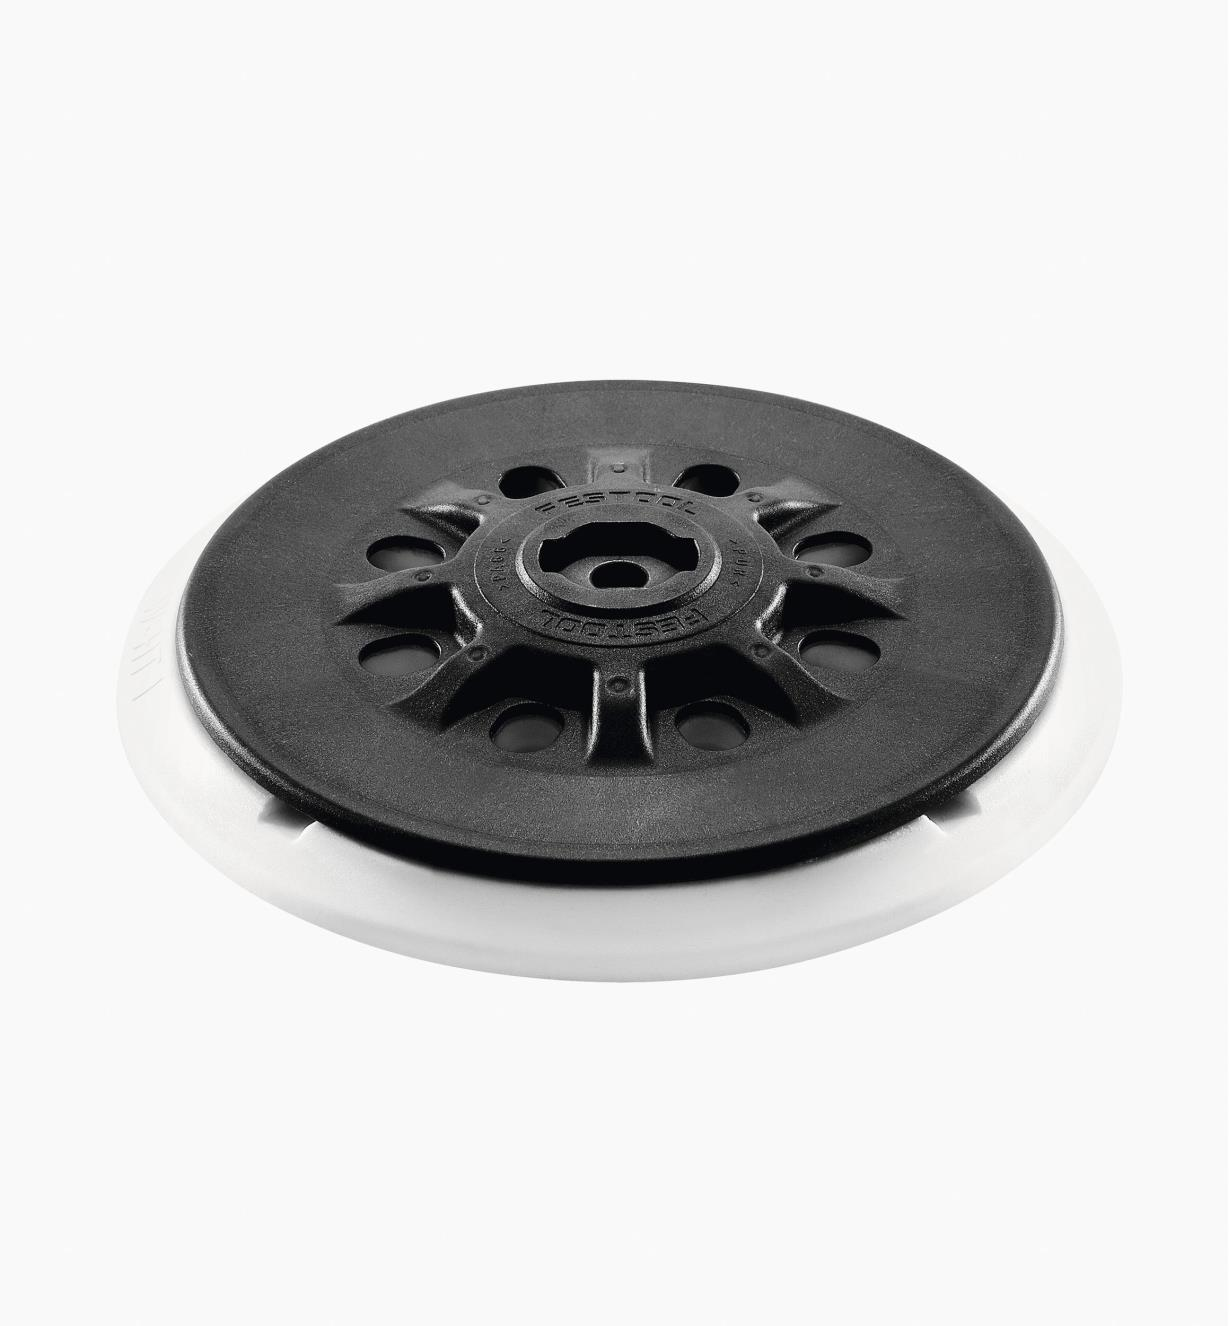 ZA202458 - Fusion-Tec MJ2 Sanding Pad Soft D150